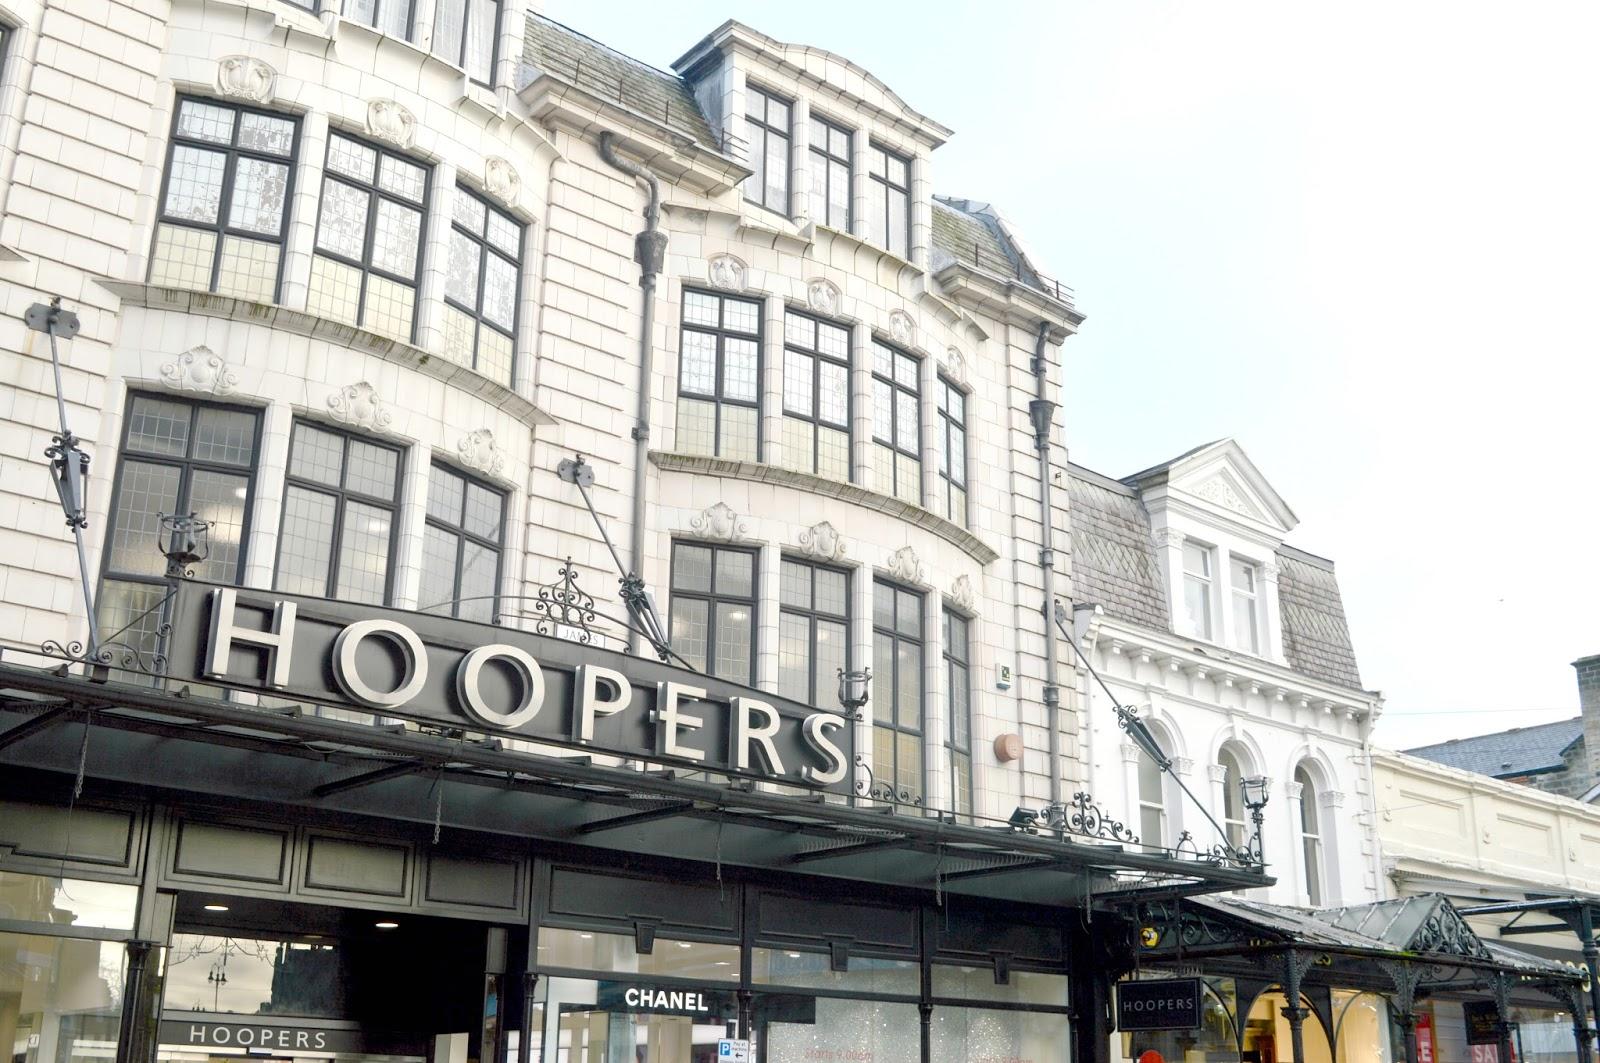 A Weekend in Harrogate - Hoopers